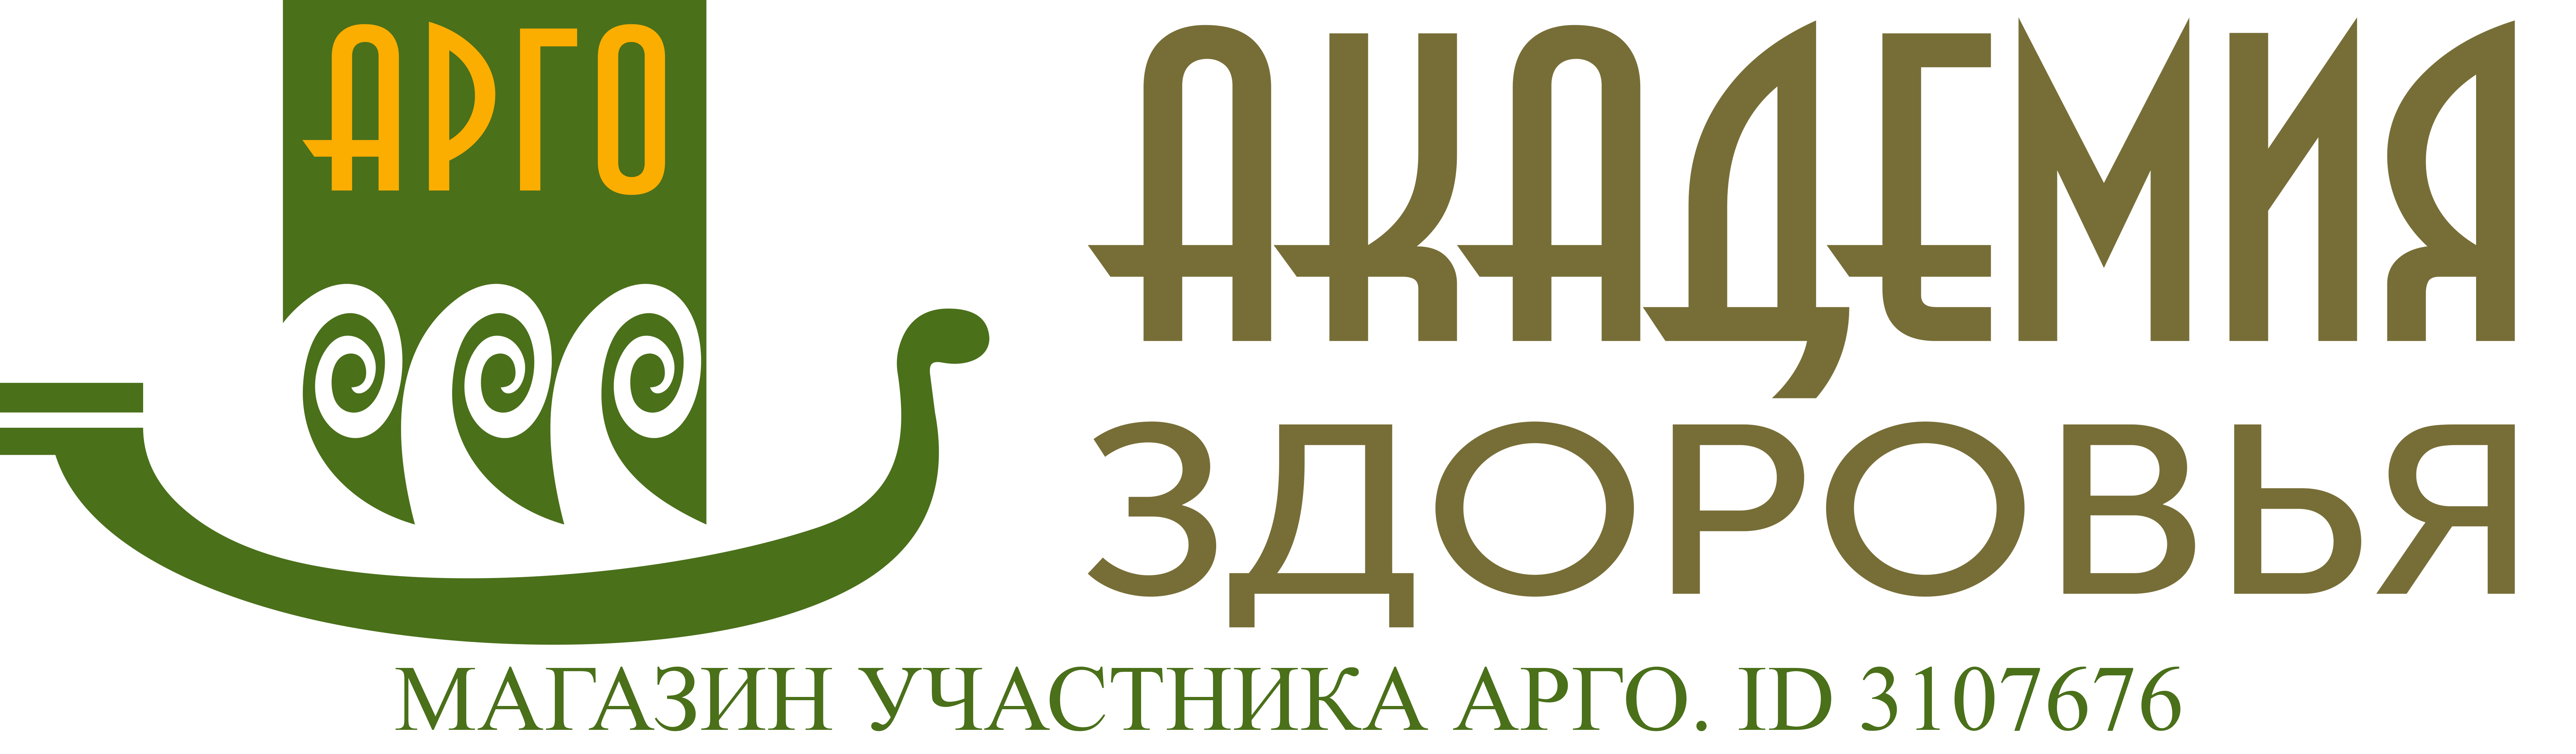 (c) Arqo.ru